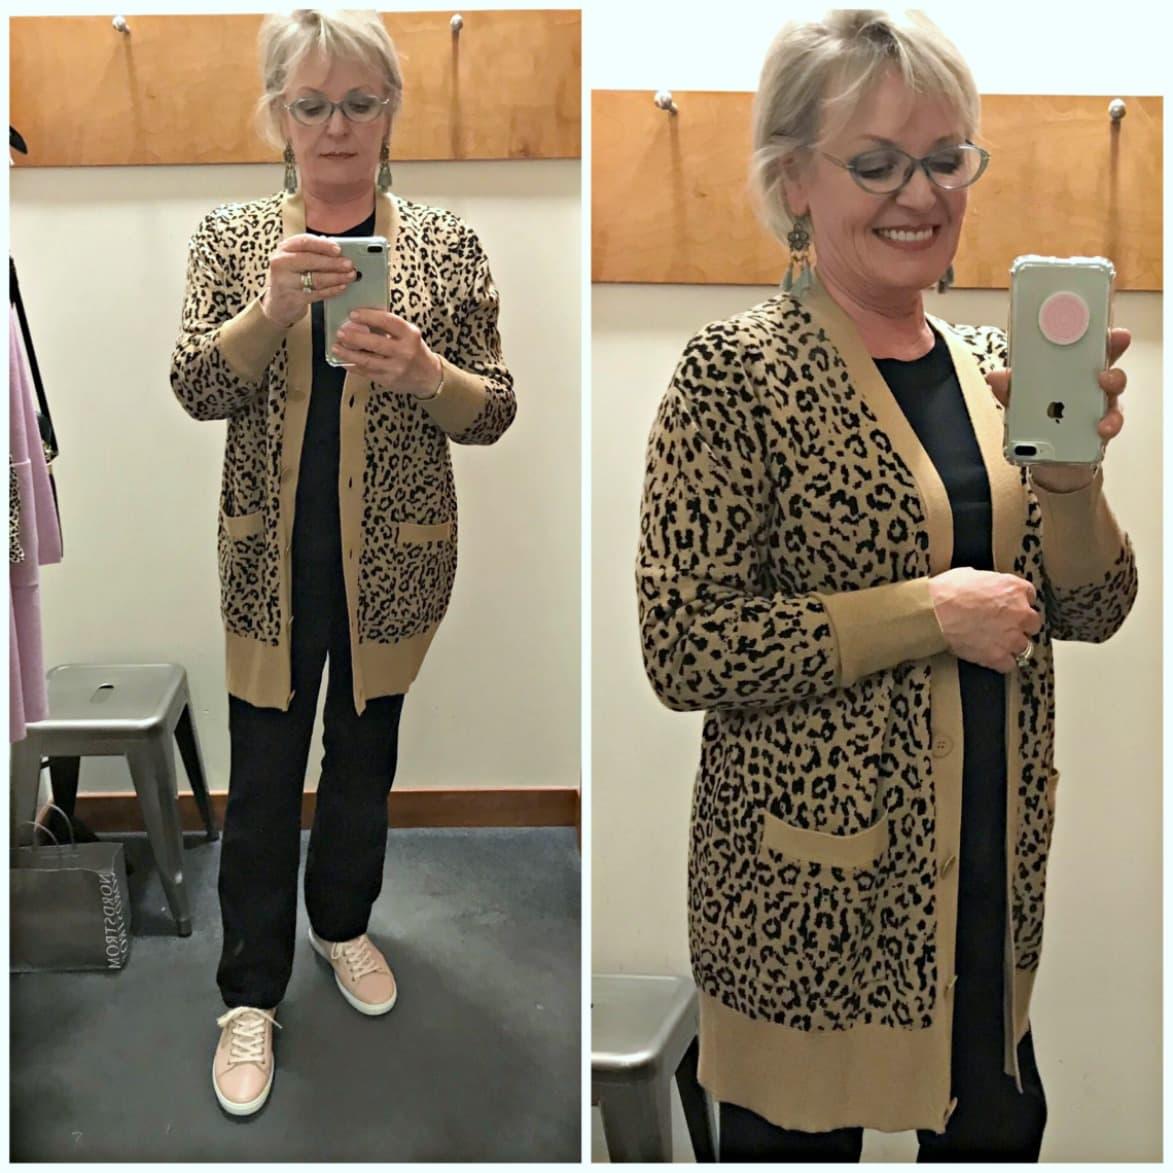 Jennifer of A Well Styled Life wearing J Crew leopard cardigan over NYDJ black jeans